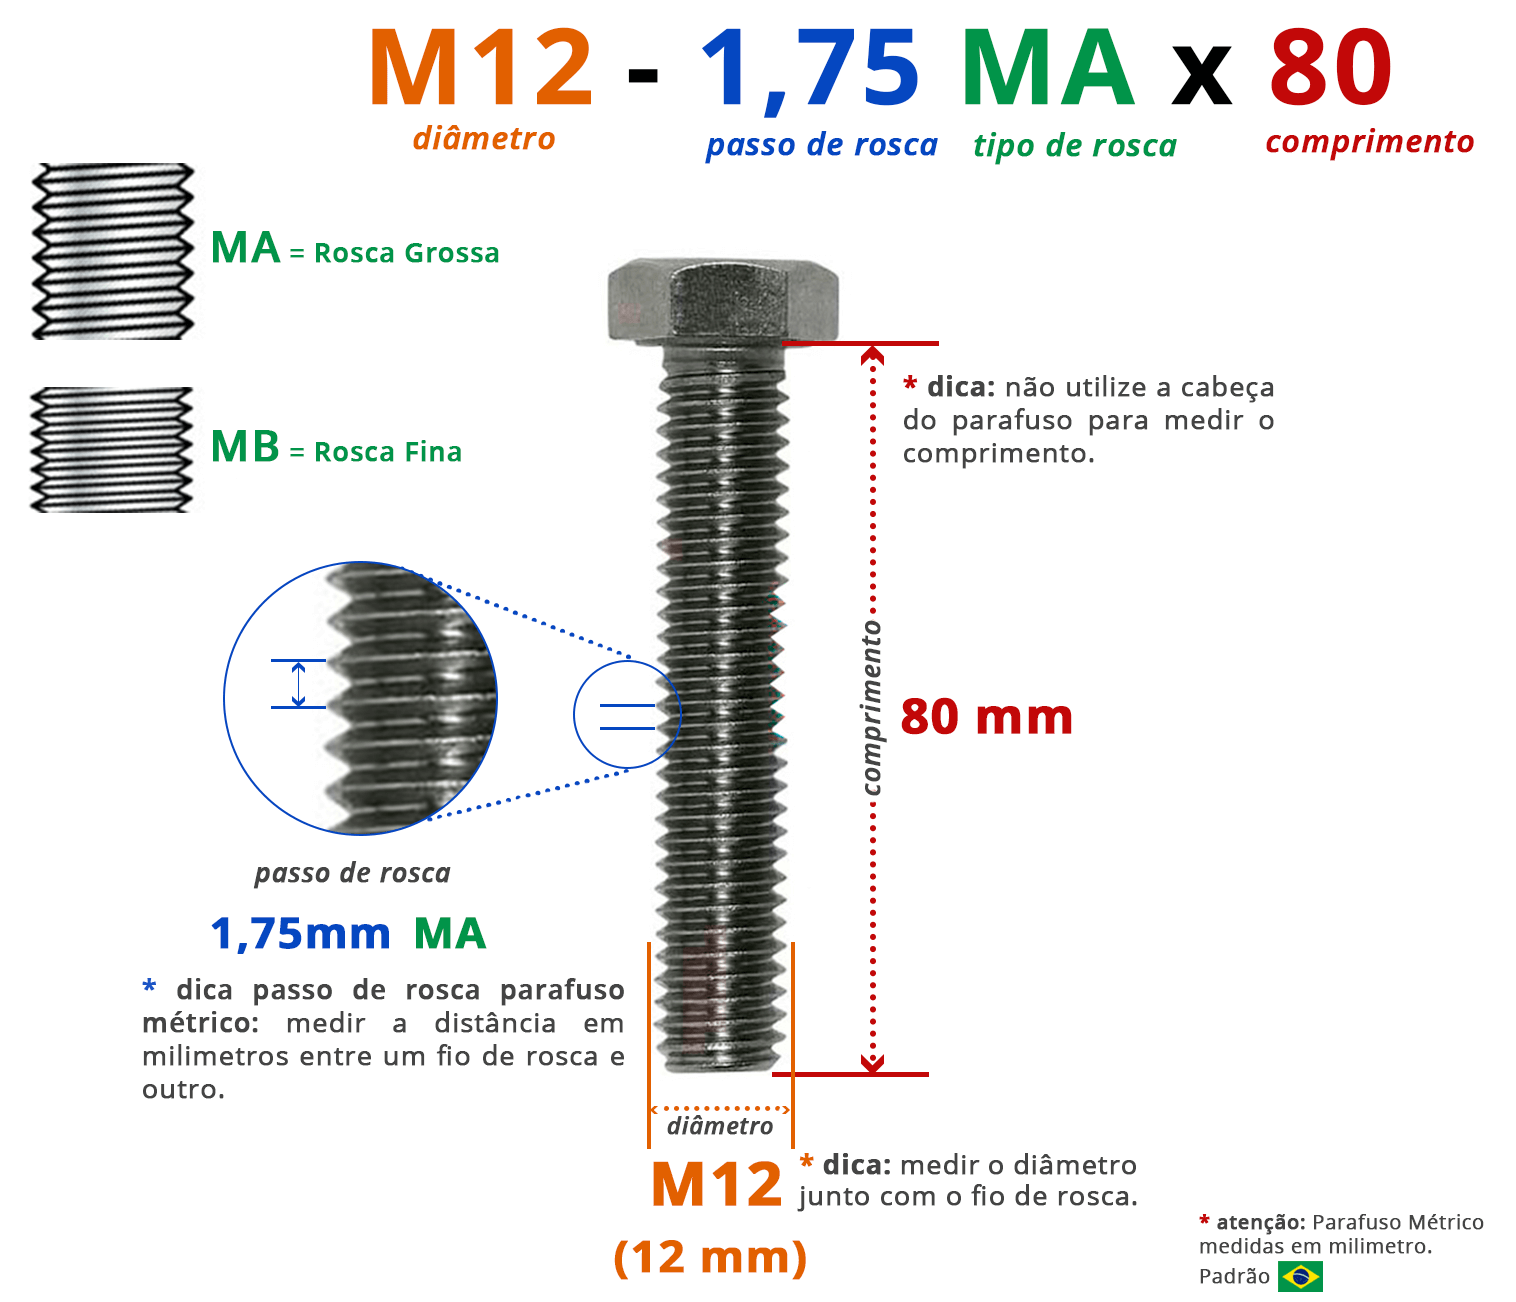 PARAFUSO SEXTAVADO ROSCA INTEIRA M12 1,75 MA X 80 DIN 933 INOX A2